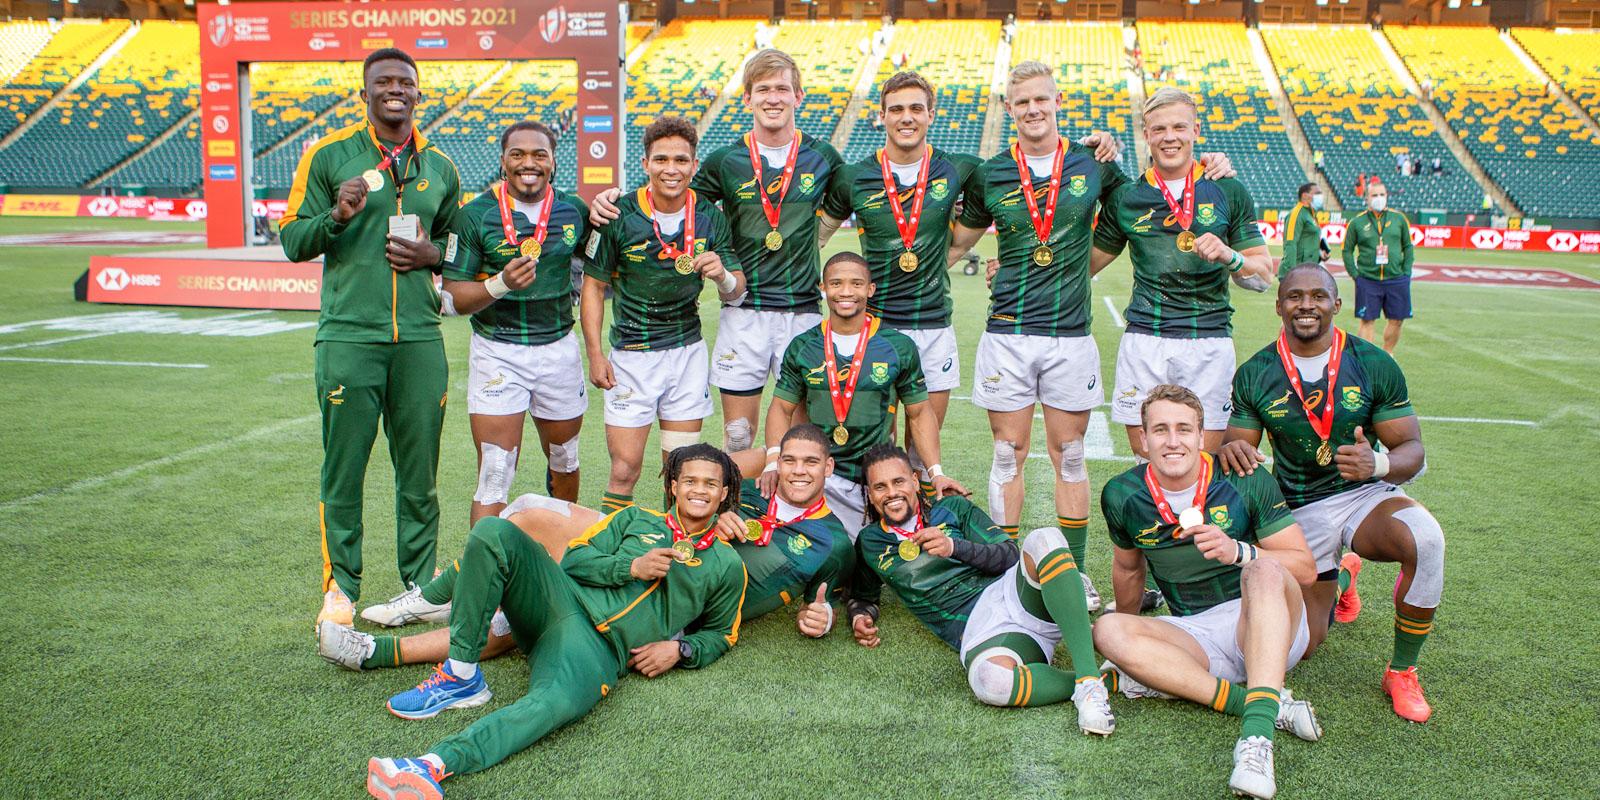 HSBC World Rugby Sevens Series 2021 winners.